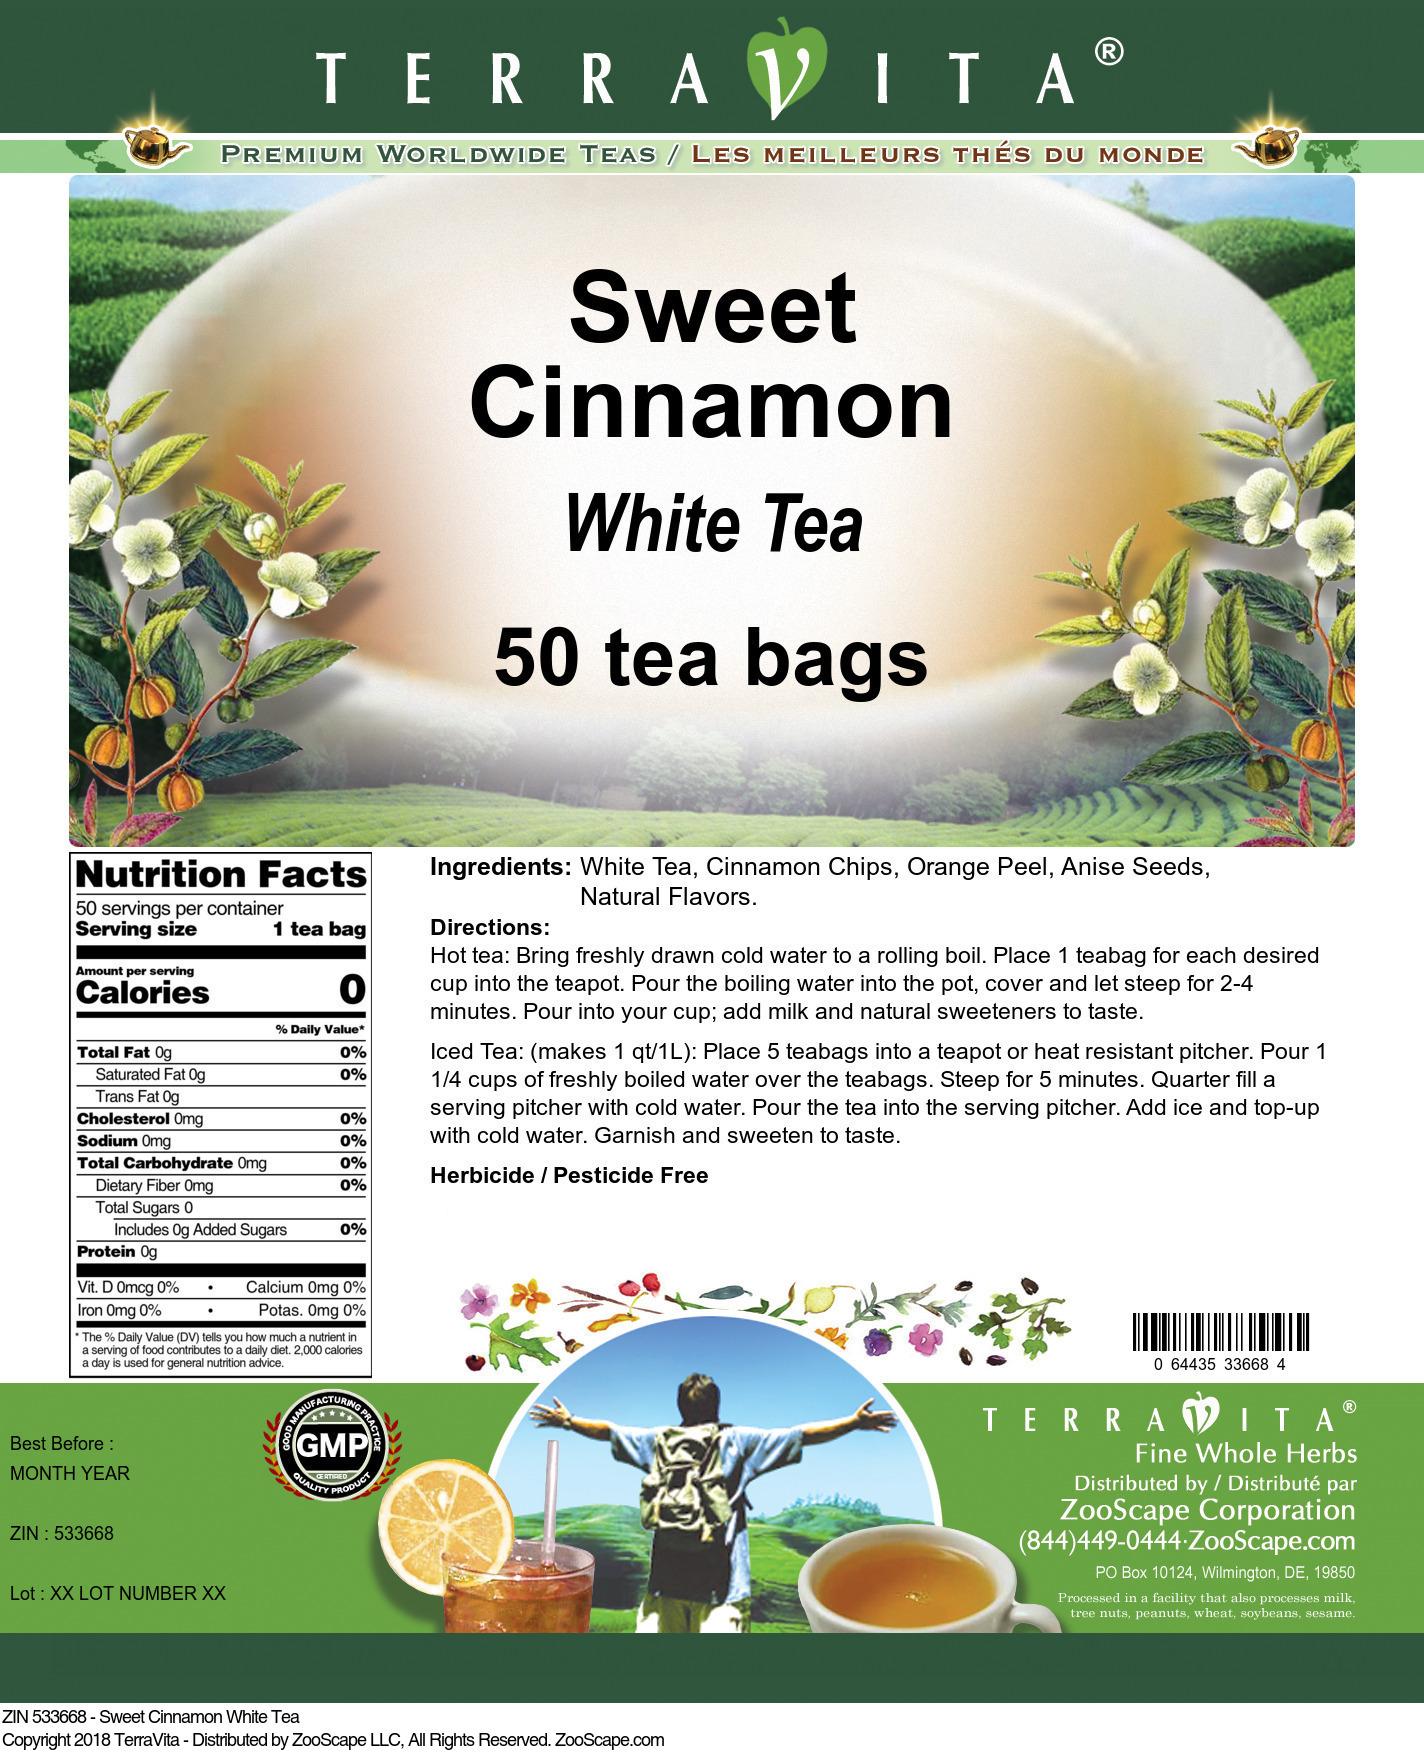 Sweet Cinnamon White Tea